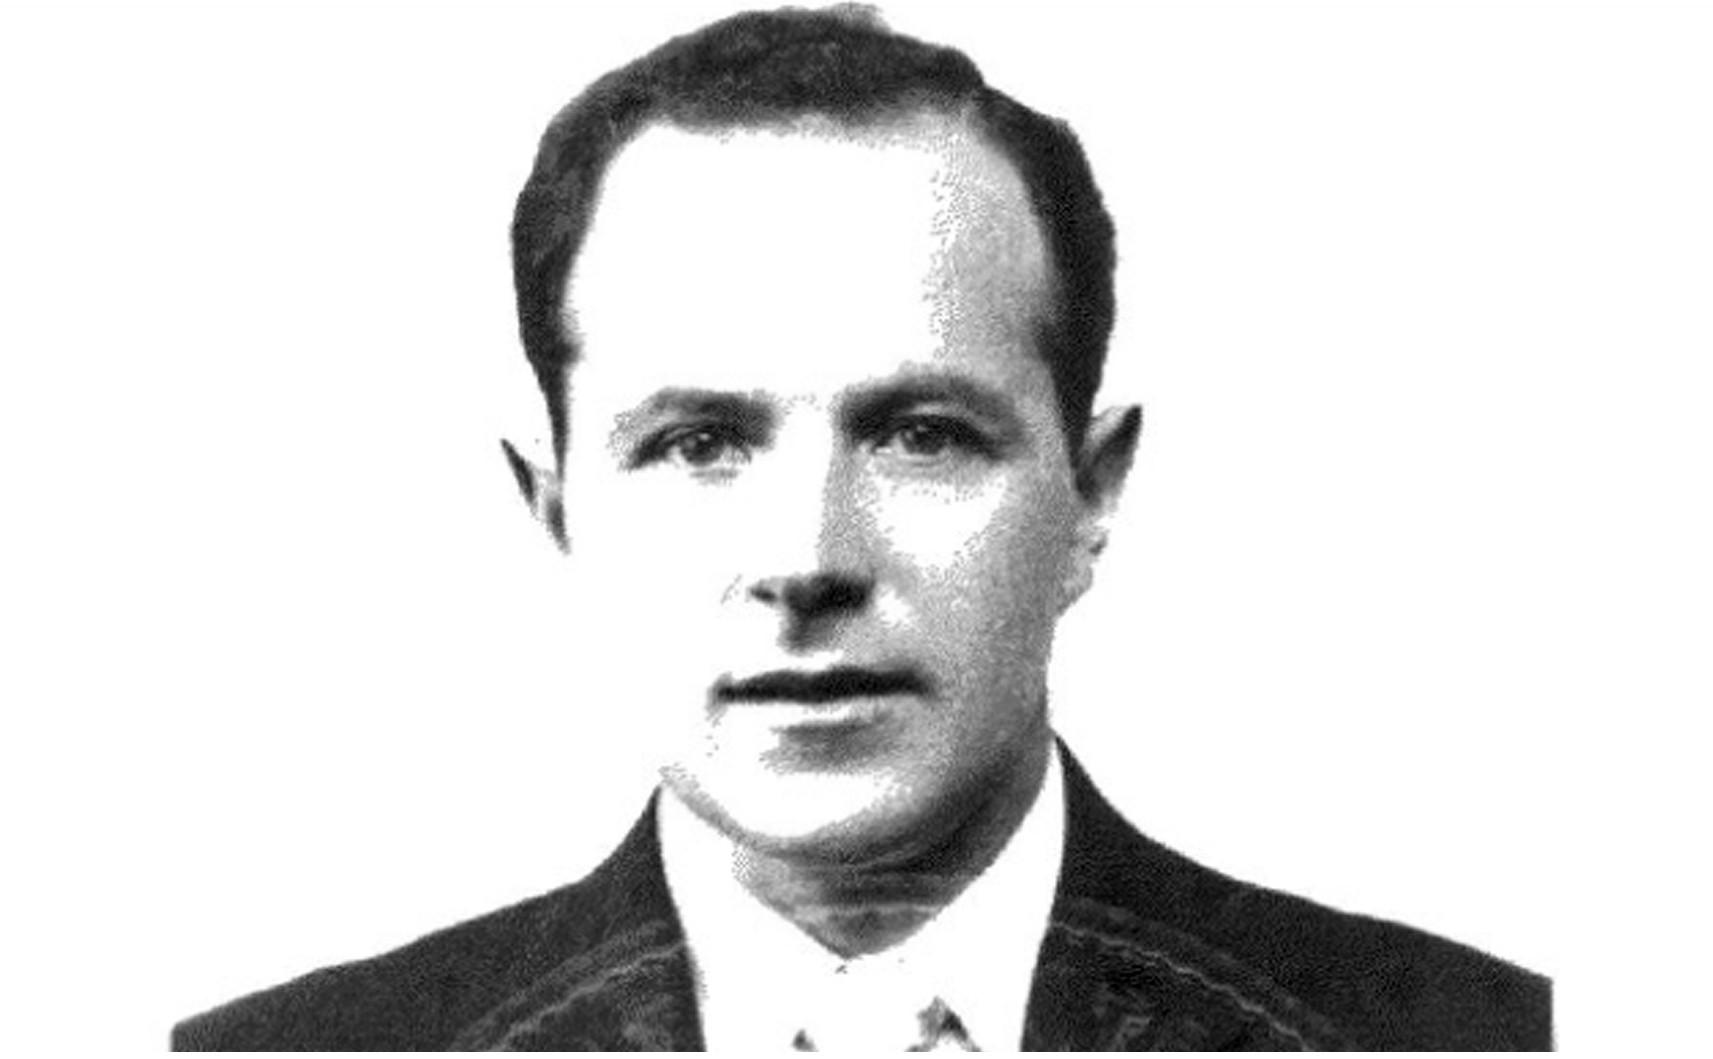 Bývalý nacistický dozorca v koncentračnom tábore  Jakiw Palij